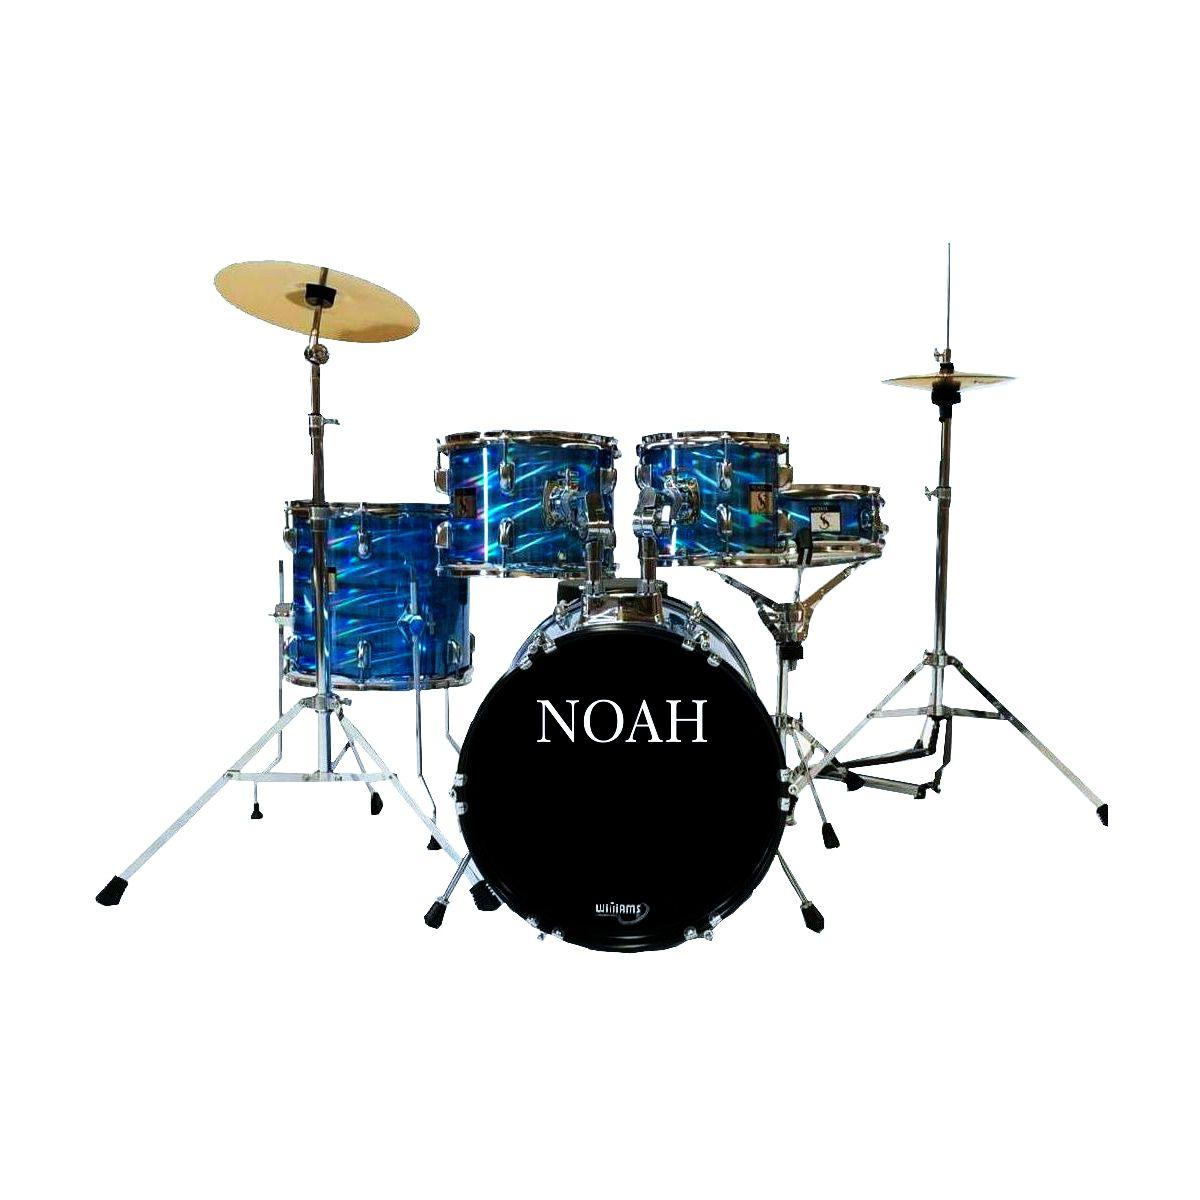 Bateria Acústica Noah Sc5 Bumbo 16 Completa Blue Wave